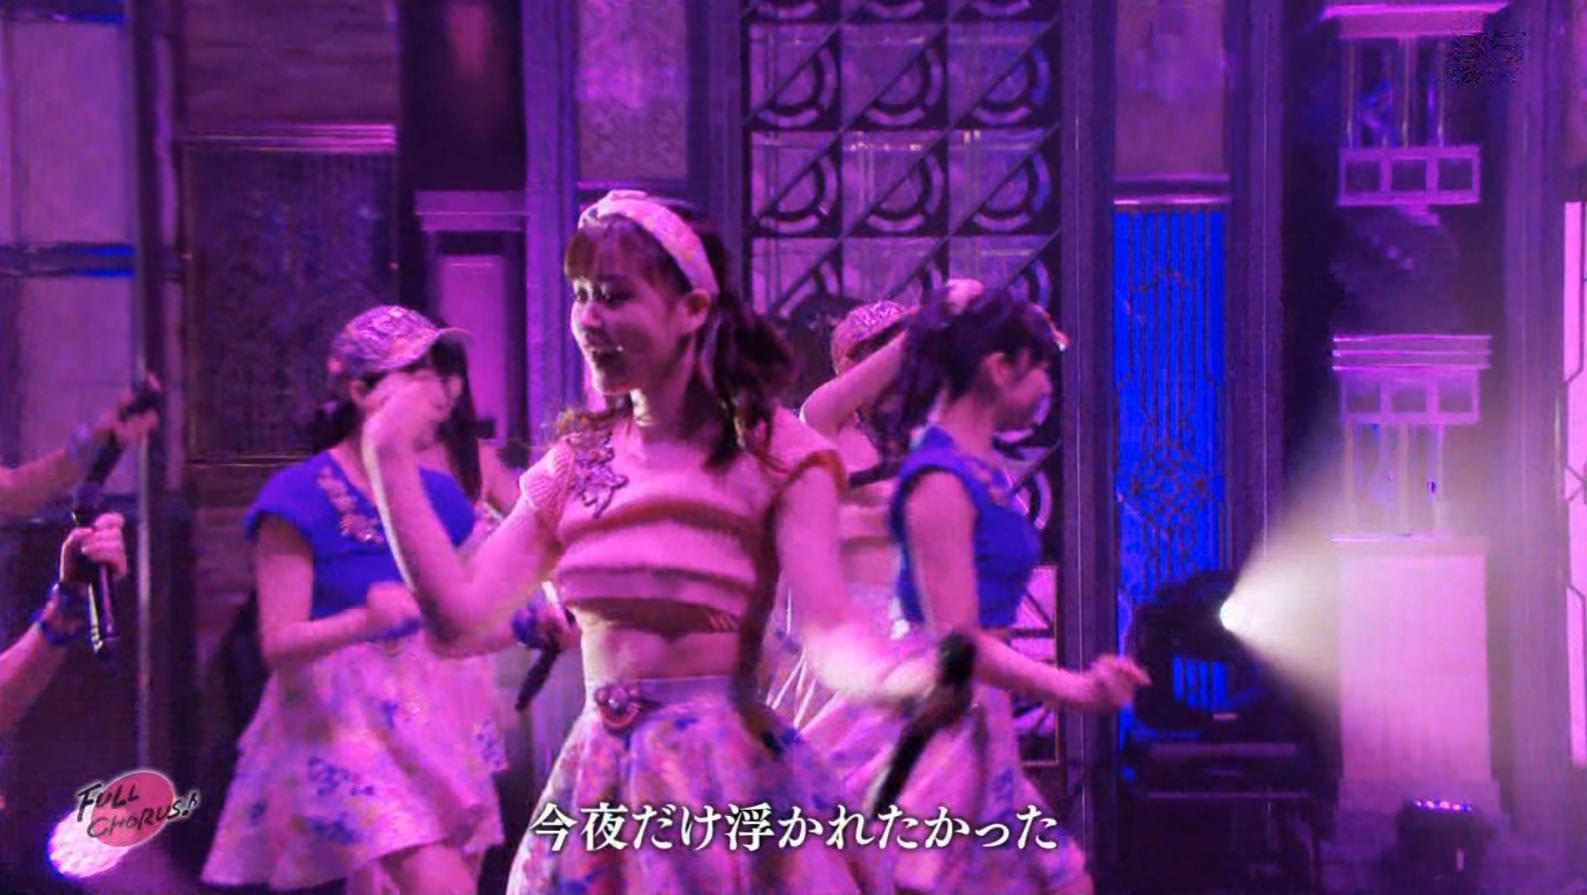 http://www.mybitchisajunky.com/whg/picture/c89b8aea17d7a7b689ee9e769c8b97c790ce43fa.jpg